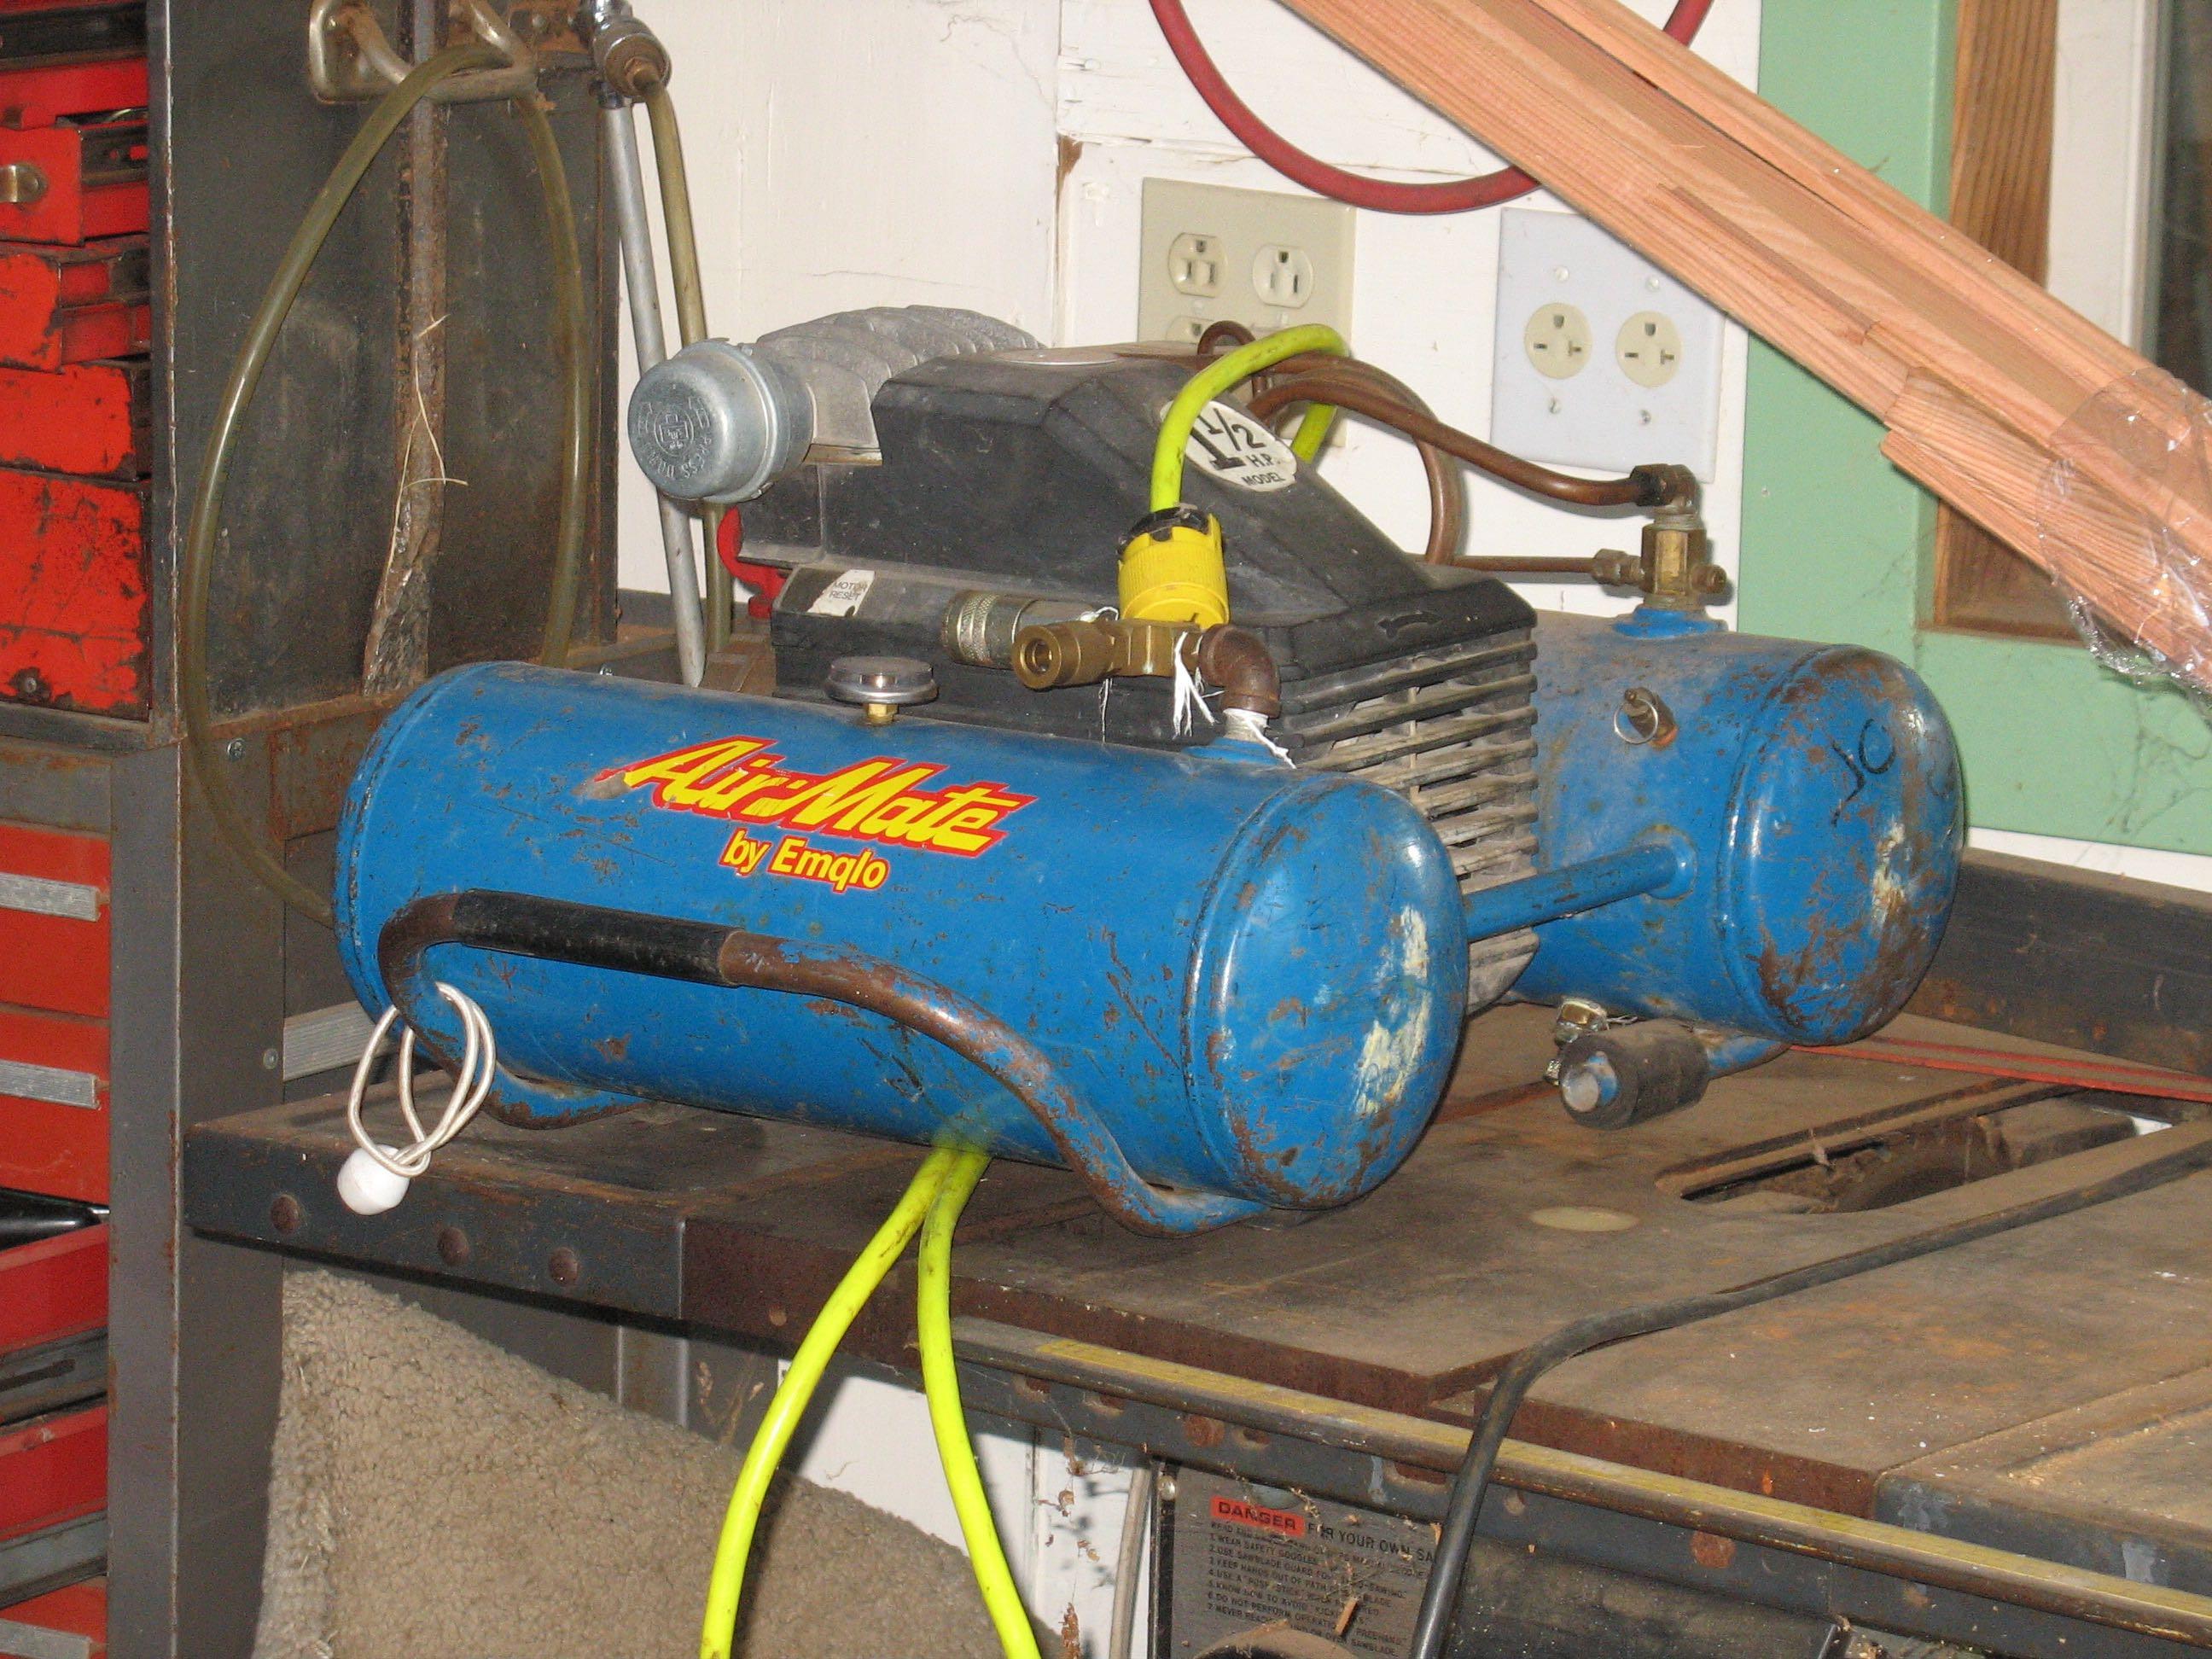 compressor for multiple trim nailers-img_2233.jpg